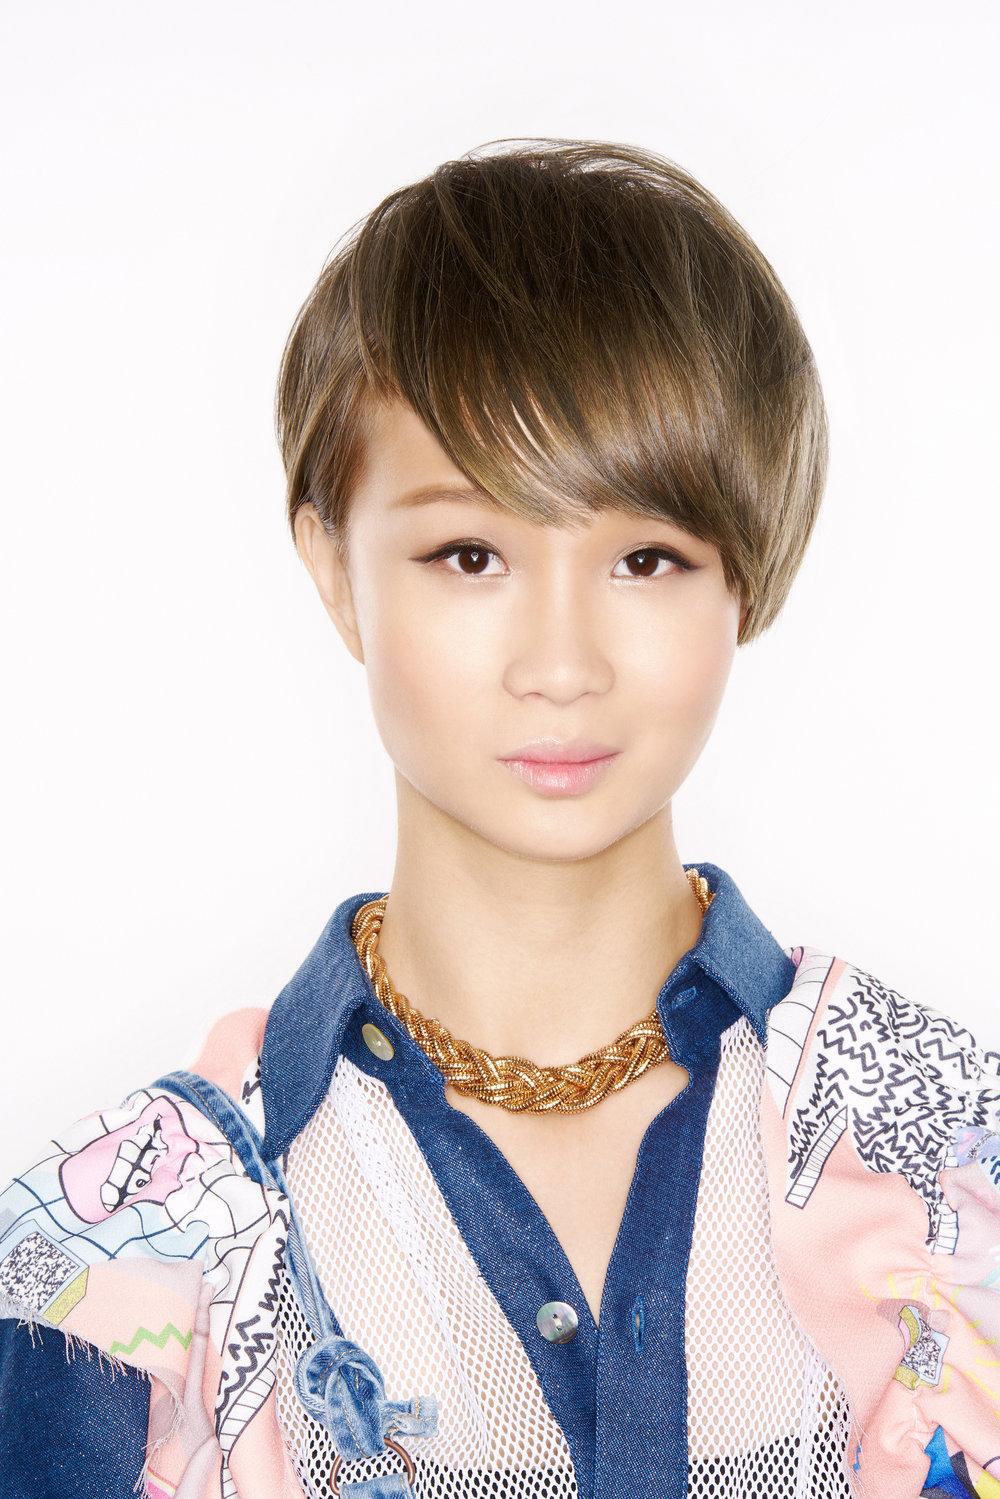 Becka_Profile_2.jpg